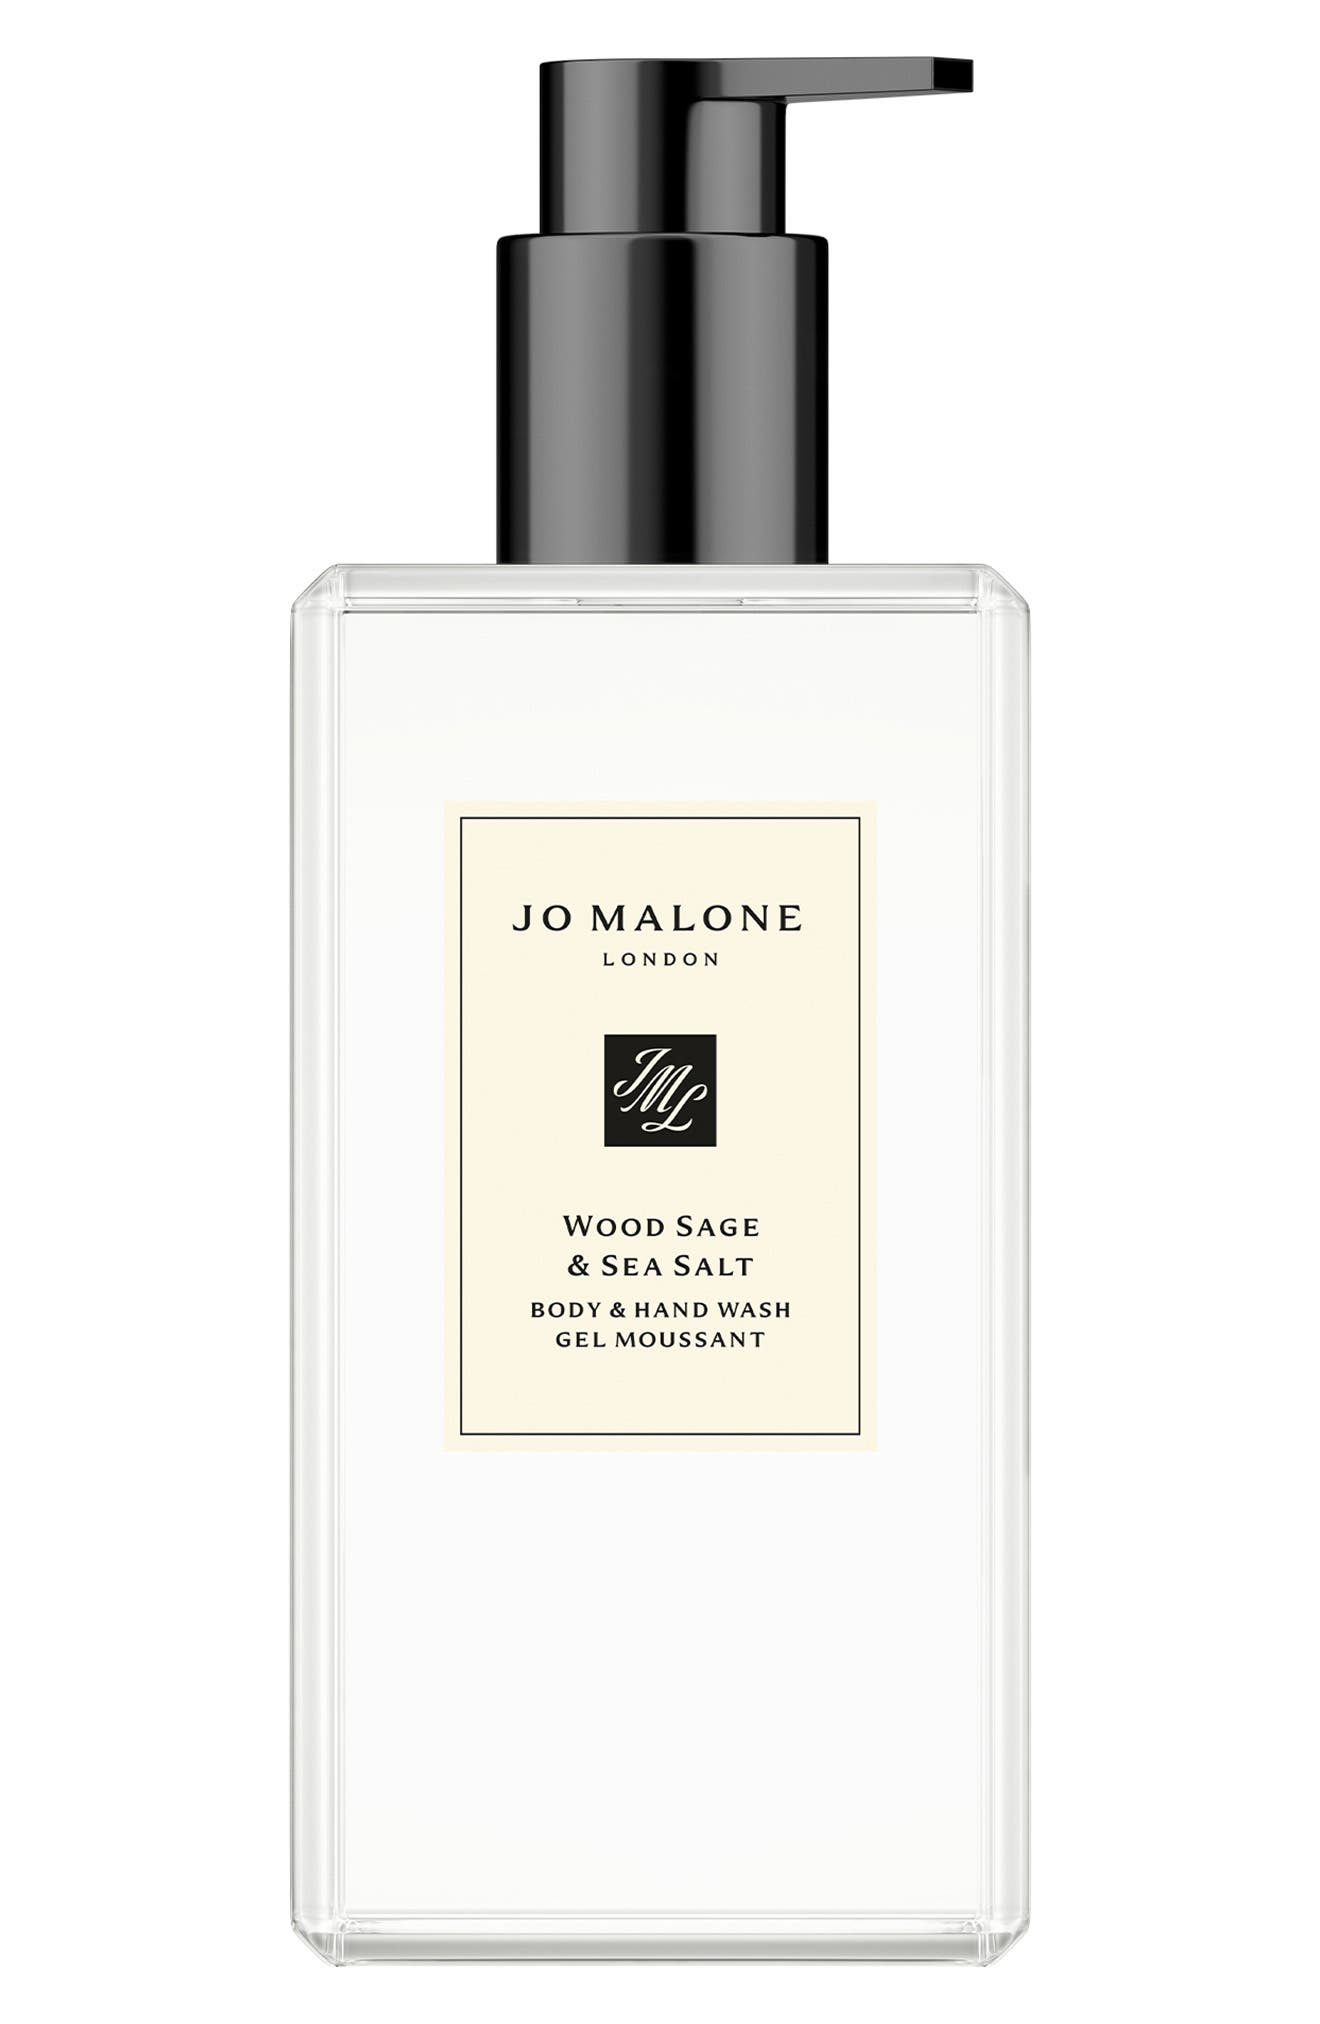 Jo Malone London(TM) Jumbo Size Wood Sage & Sea Salt Body & Hand Wash